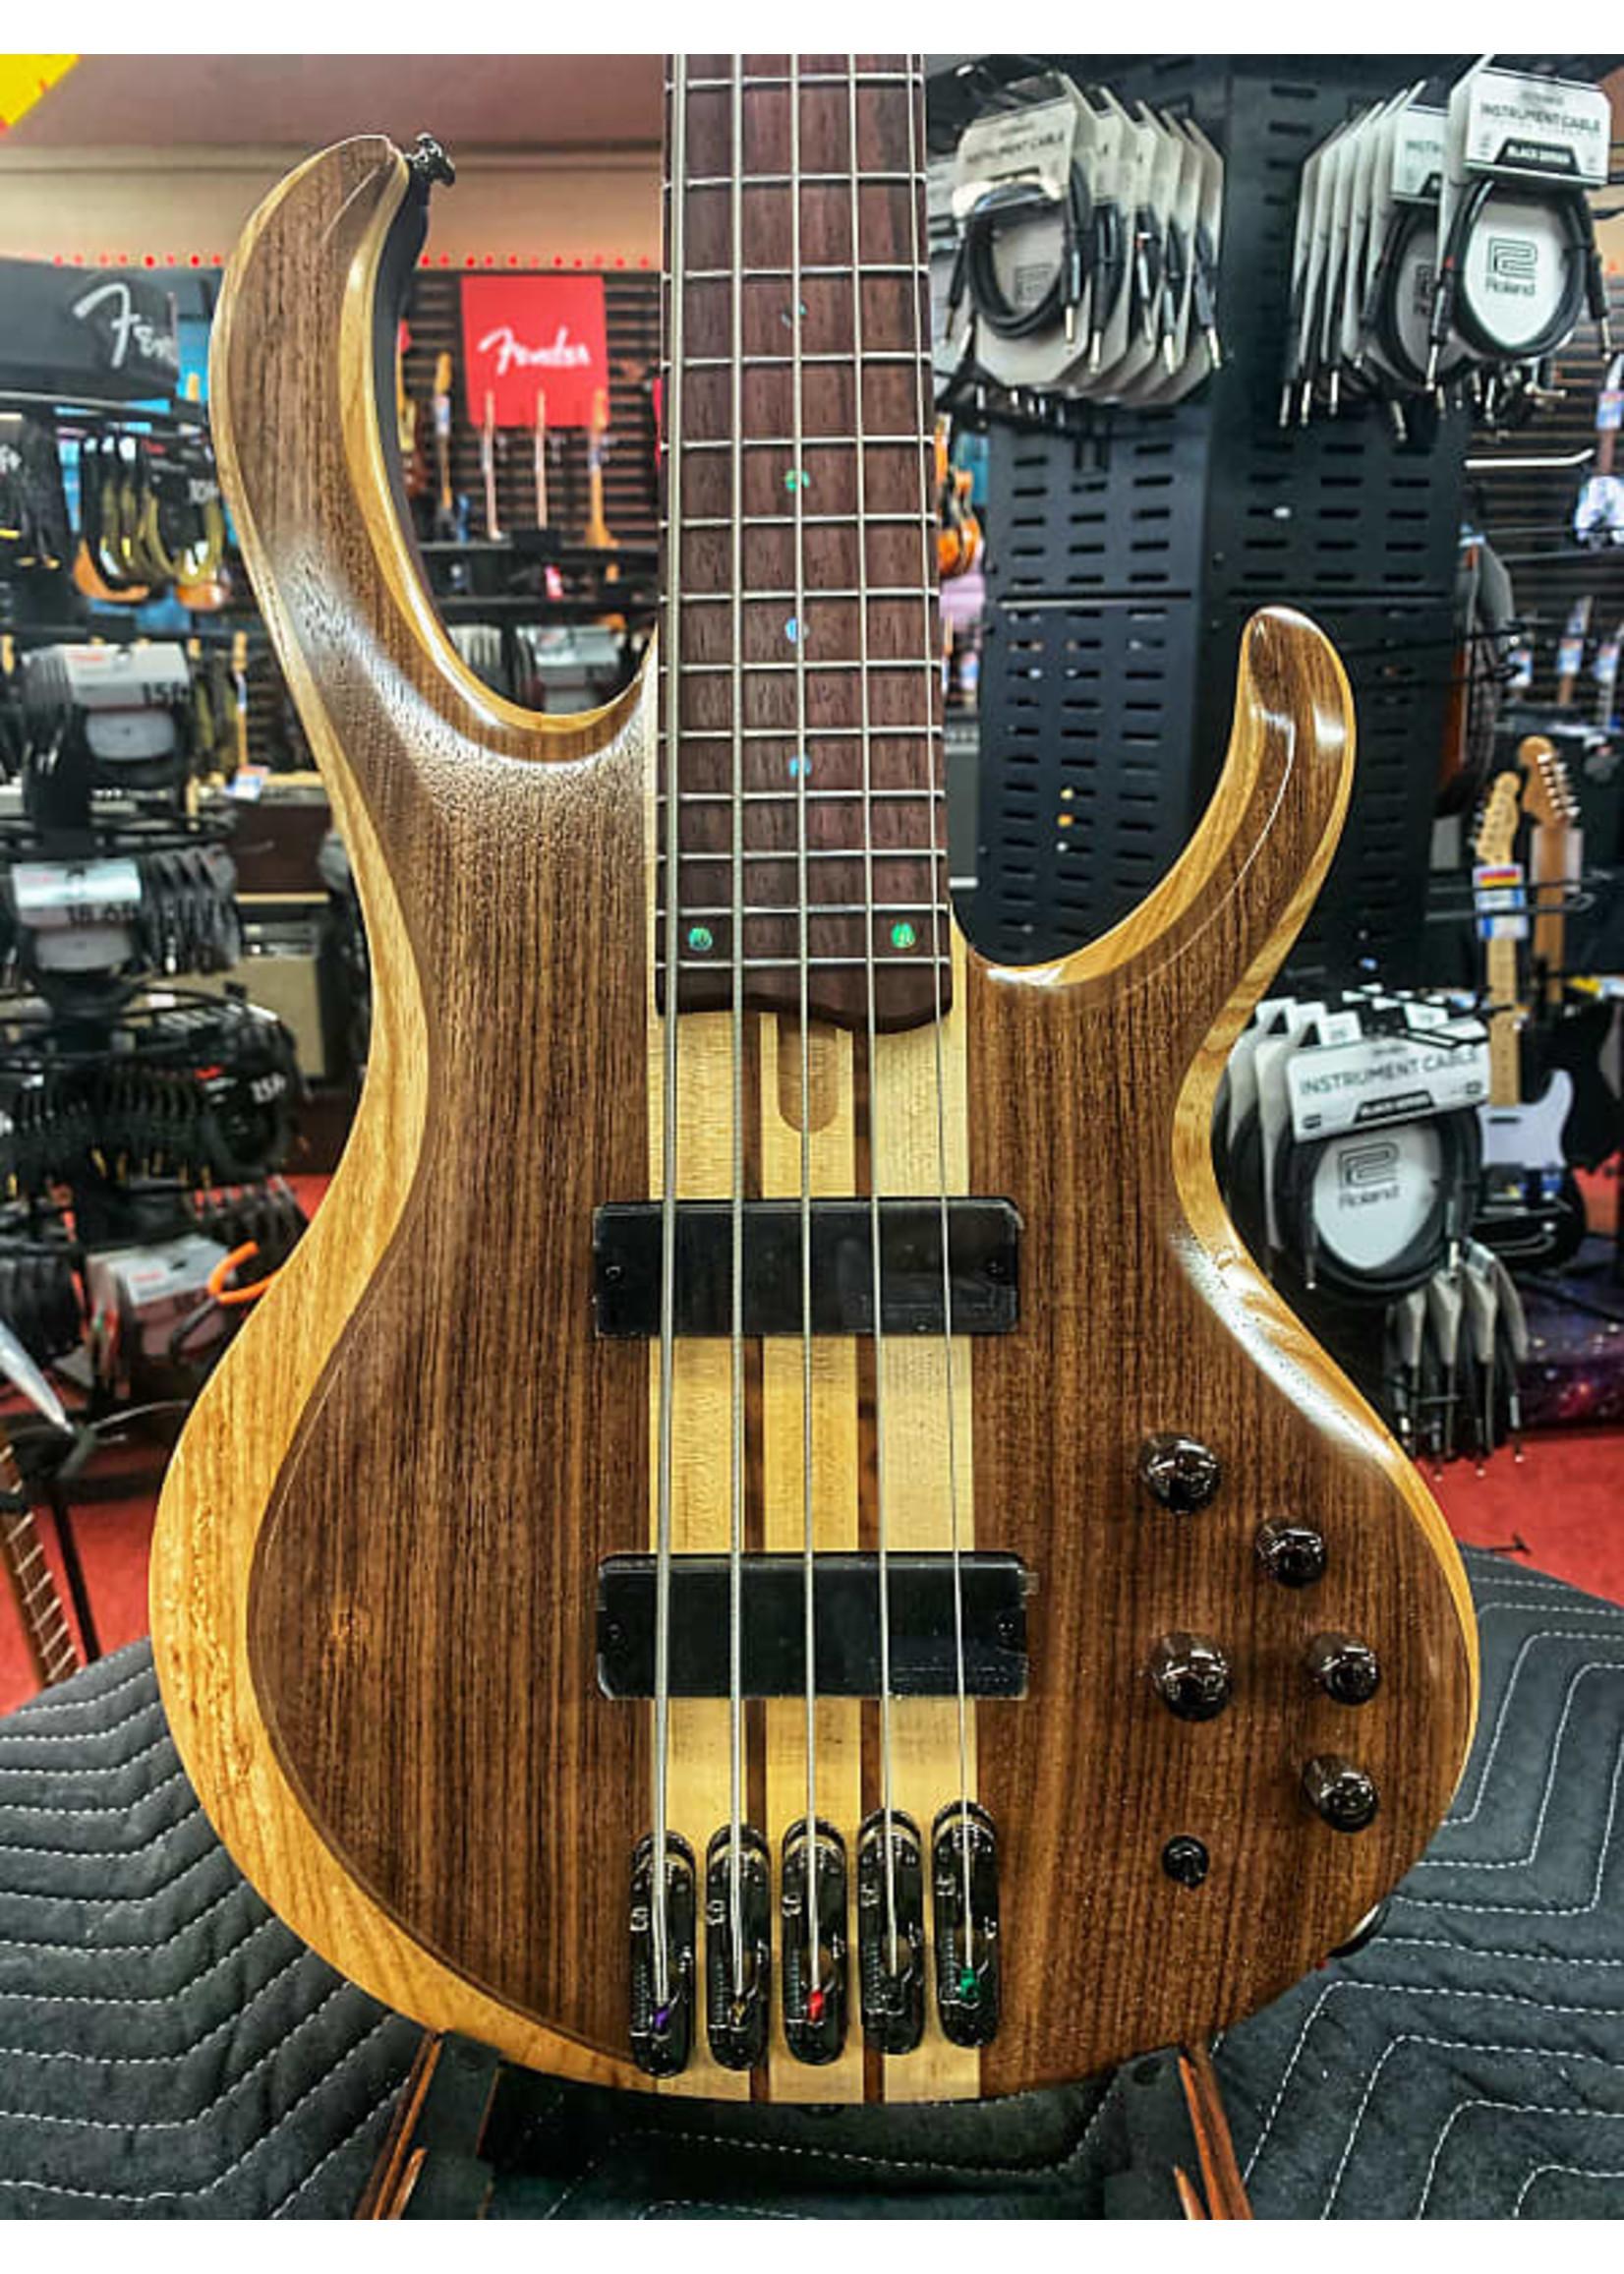 Ibanez Ibanez Standard BTB745 Bass Guitar - Natural Low Gloss